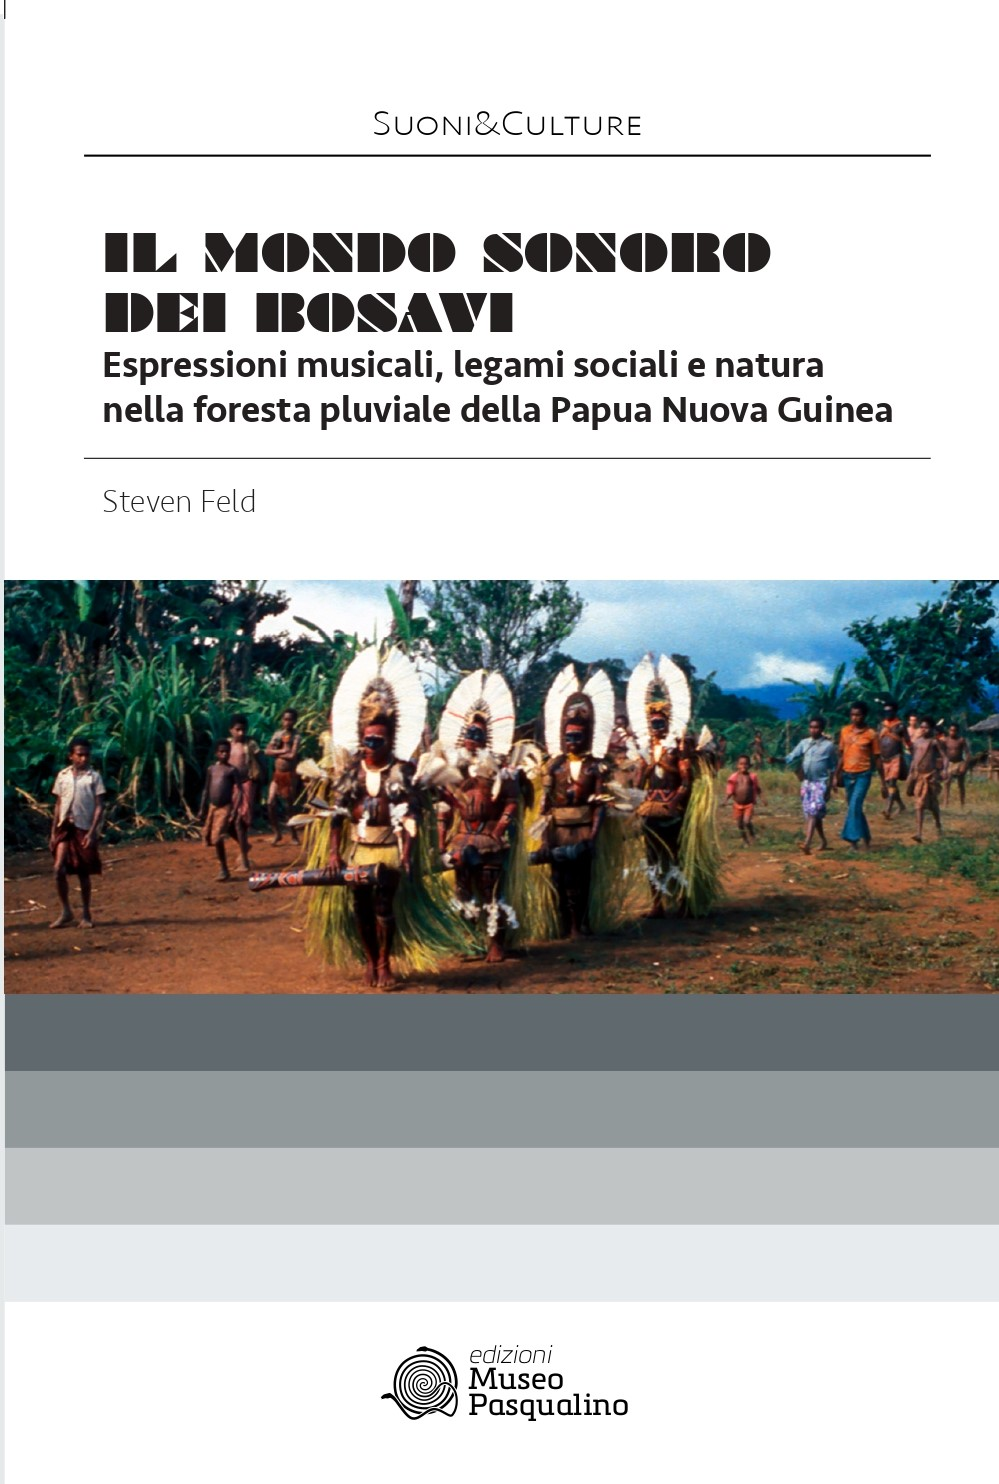 copertina_Feld_bozza6_pages-to-jpg-0001.jpg - 239.97 kB